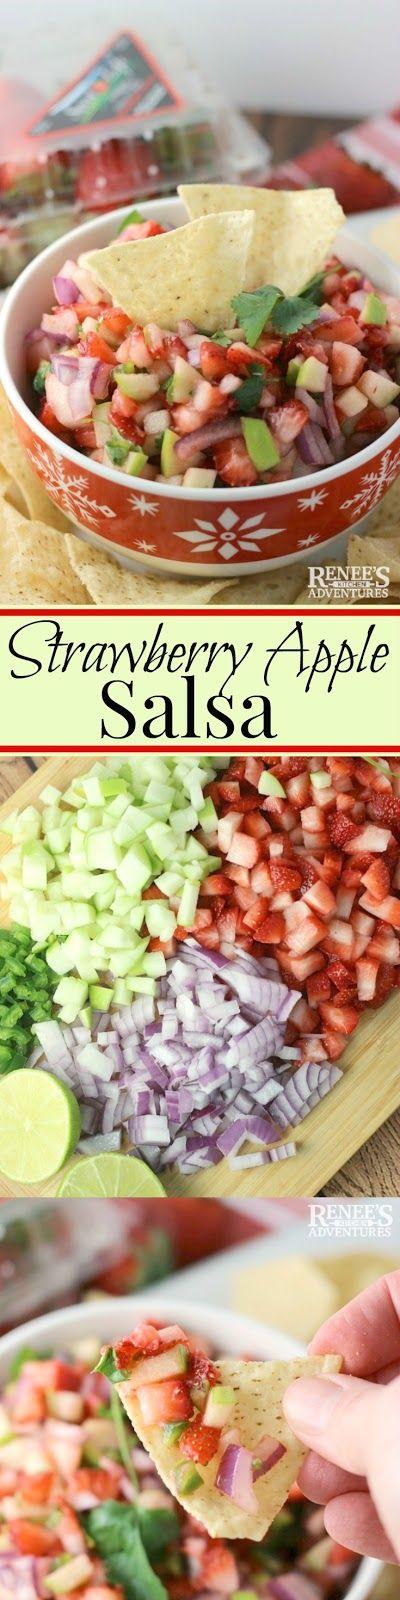 Strawberry Apple Salsa   Renee's Kitchen Adventures - easy recipe for strawberry apple salsa appetizer. Spicy, jalapeno, strawberry, apple @Flastrawberries #SundaySupper #FLstrawberry